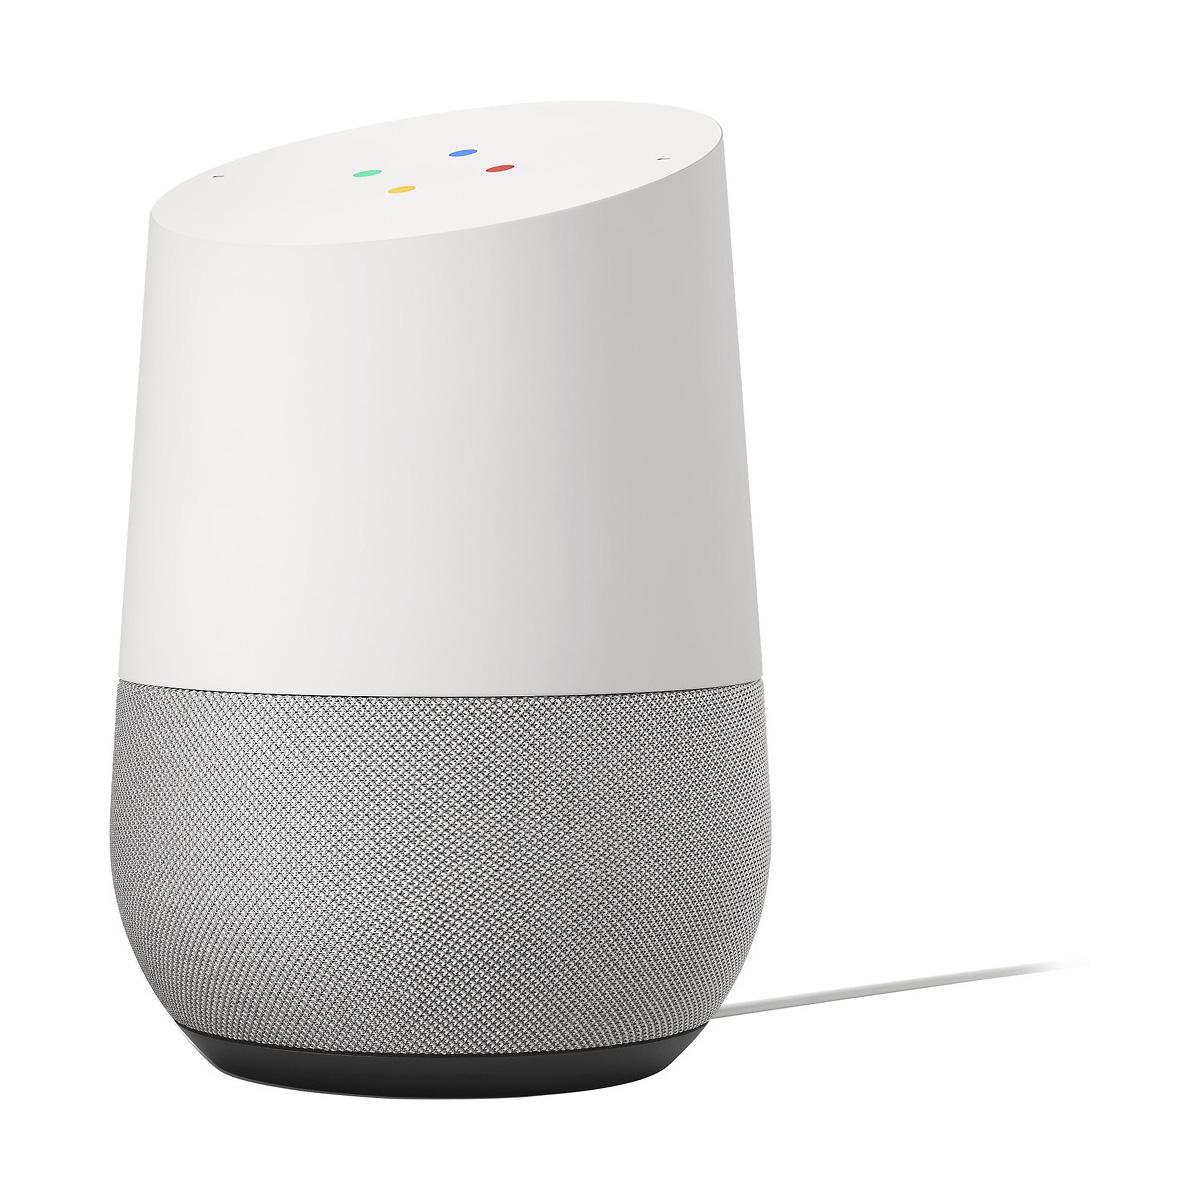 google home hands free smart speaker and voice controlled home assistant white ebay. Black Bedroom Furniture Sets. Home Design Ideas